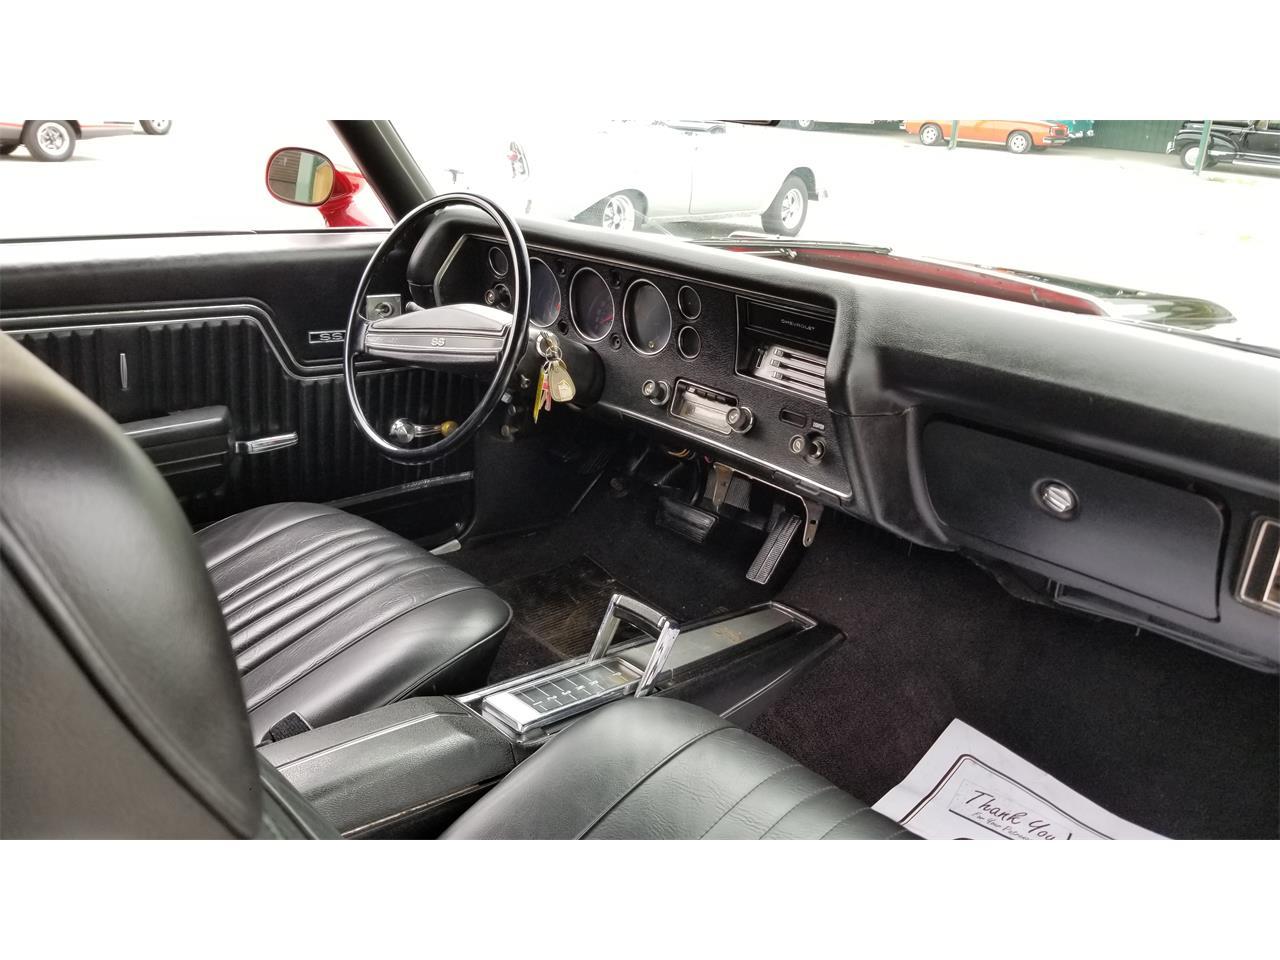 1972 Chevrolet Chevelle SS (CC-1222905) for sale in Salesville, Ohio